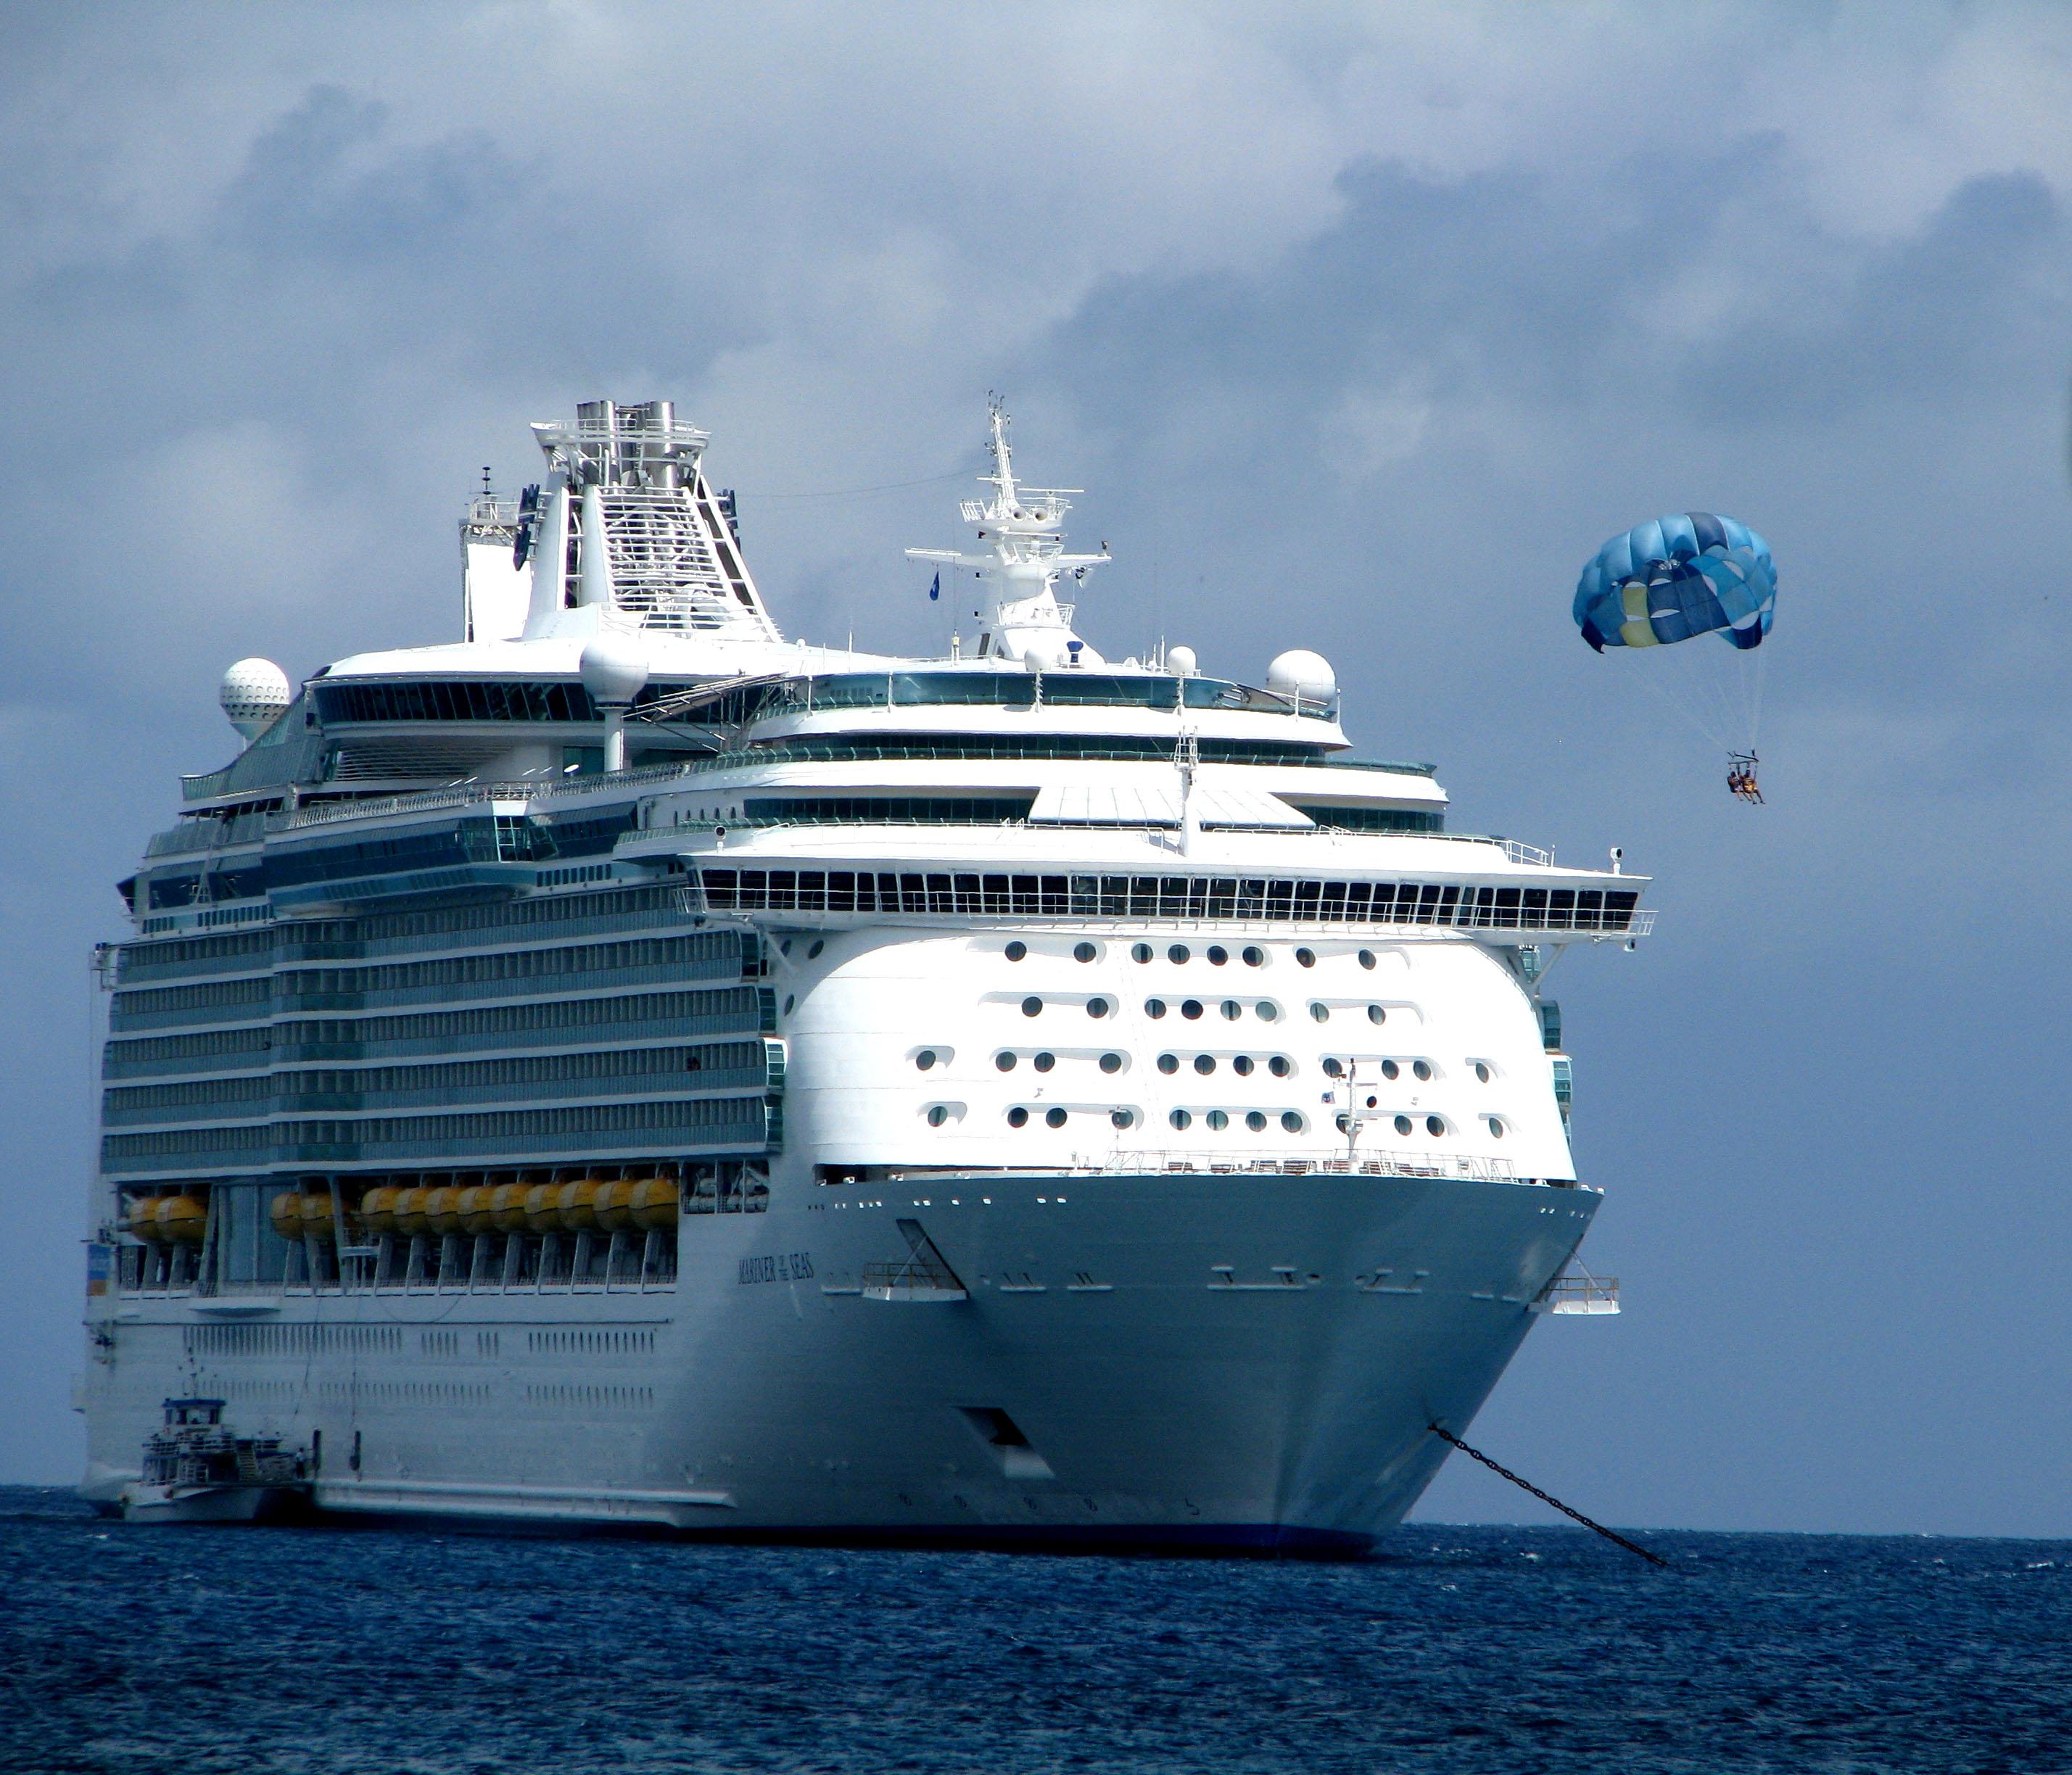 File:MS Mariner of the Seas - parasailing.jpg - Wikimedia ...